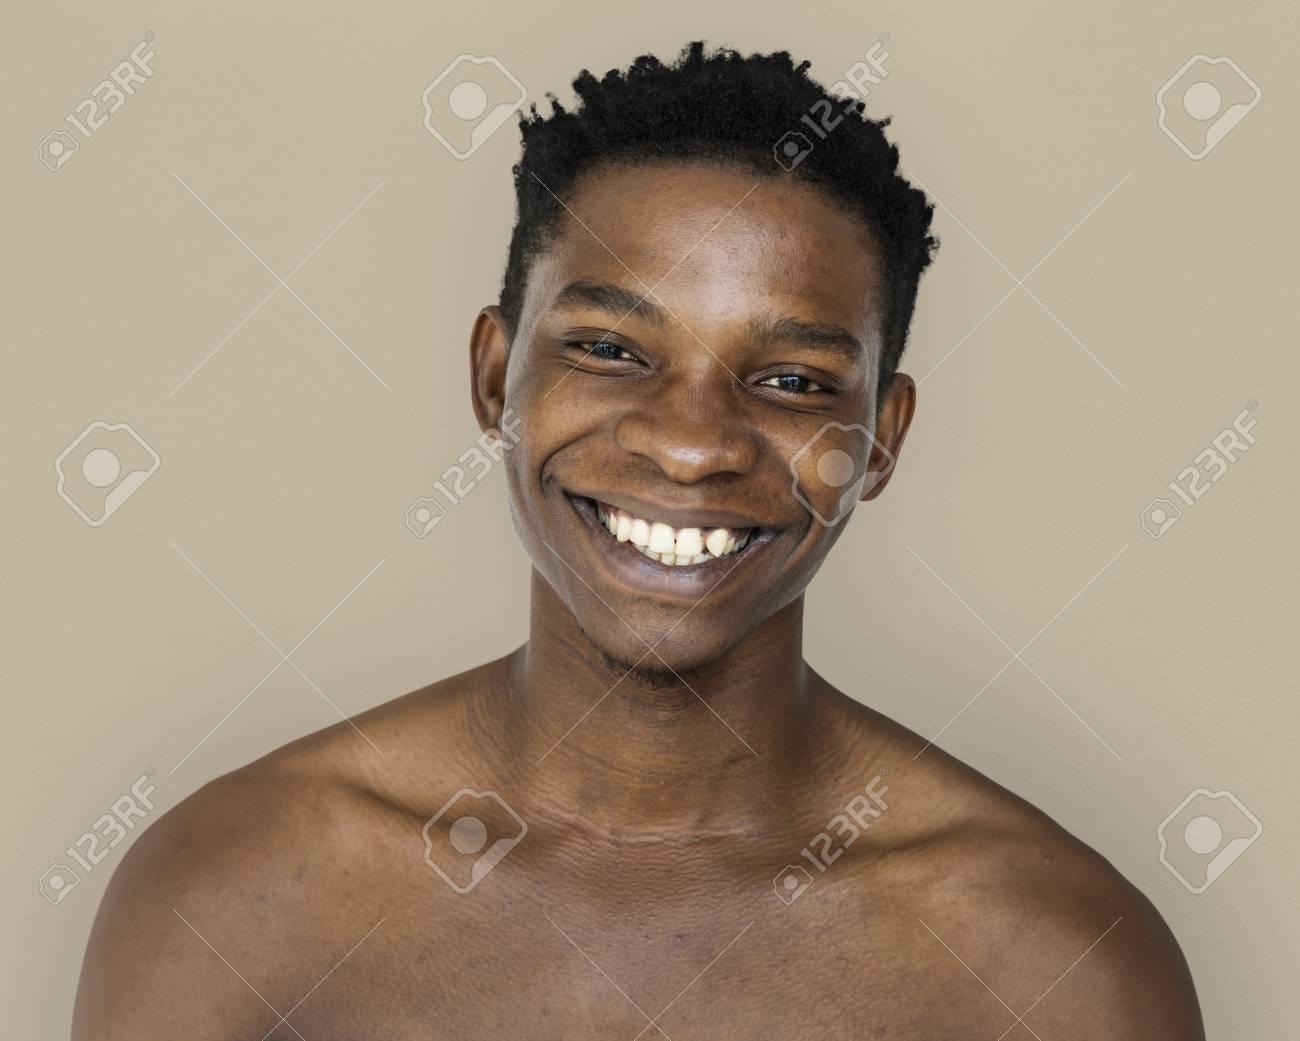 Africano nudo pic